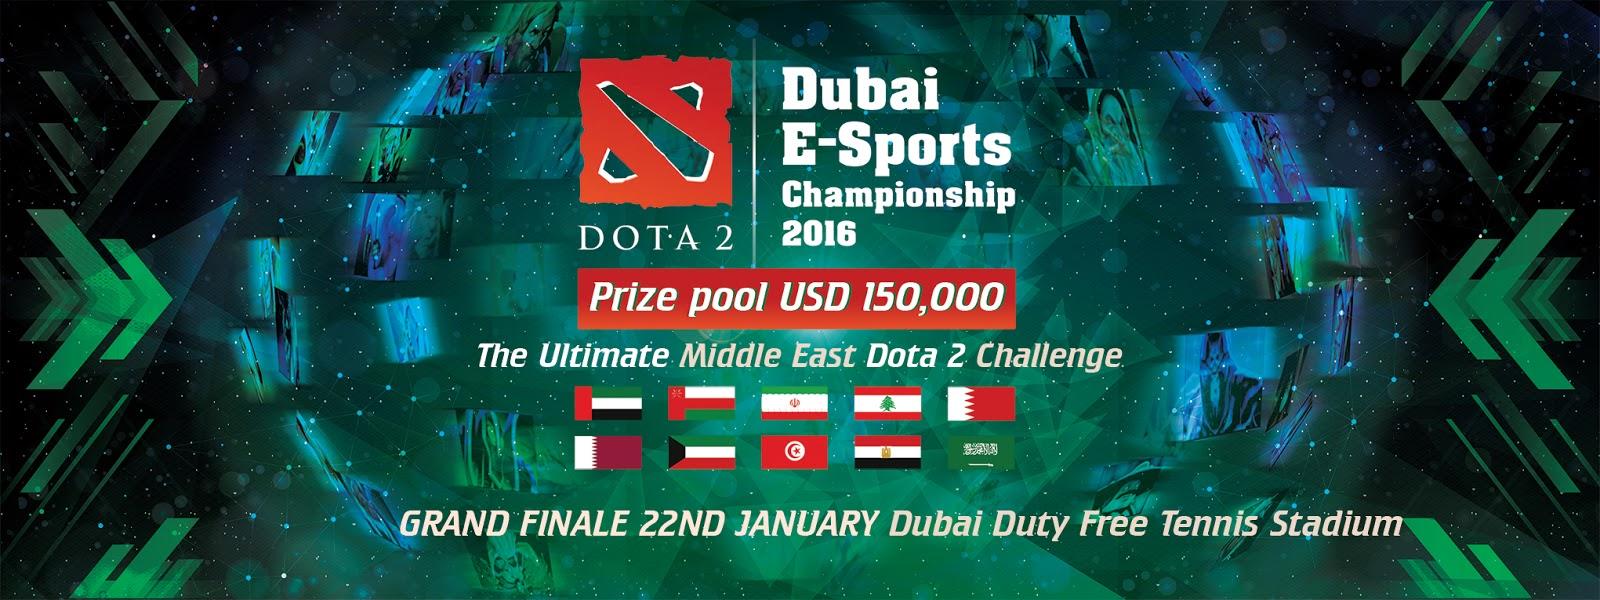 Dubai E-Sports Championship for DOTA2